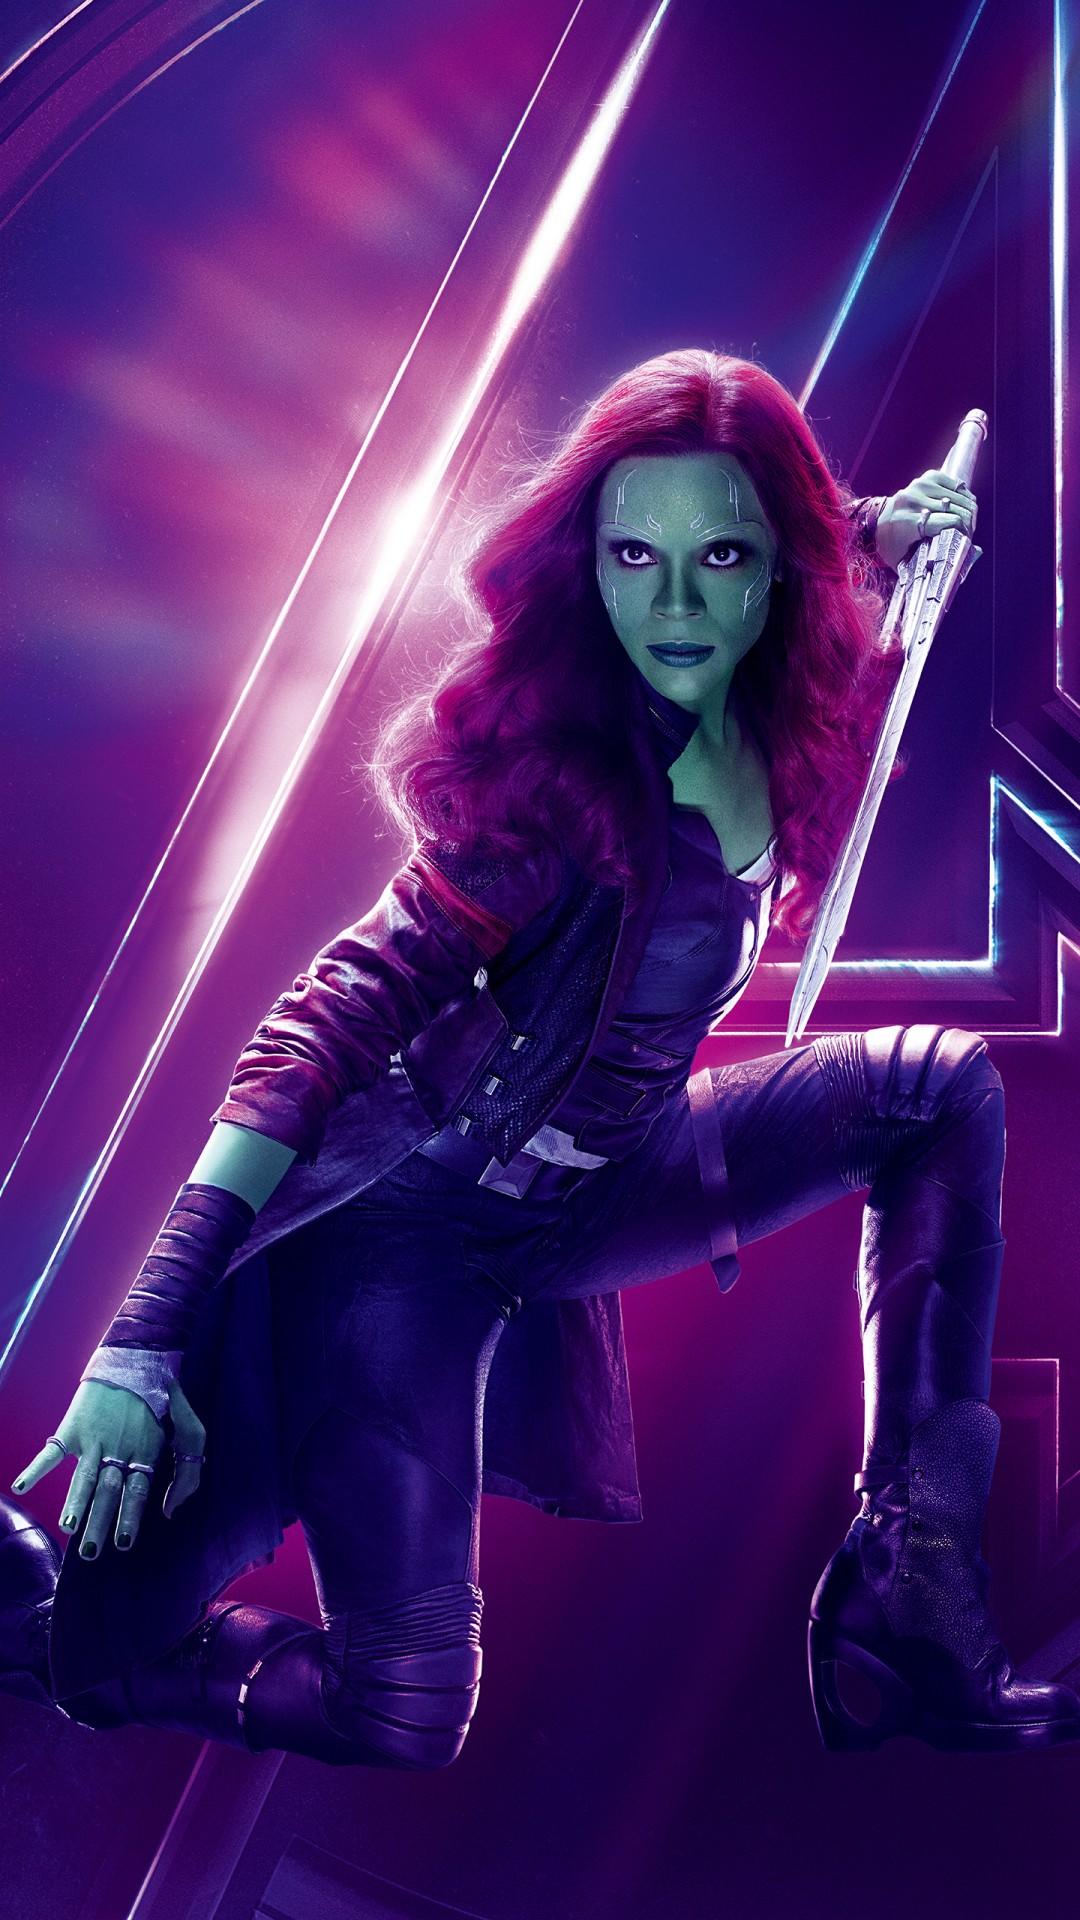 Ipad Hd Wallpaper  Zoe Saldana As Gamora In Avengers Infinity War 4k 8k